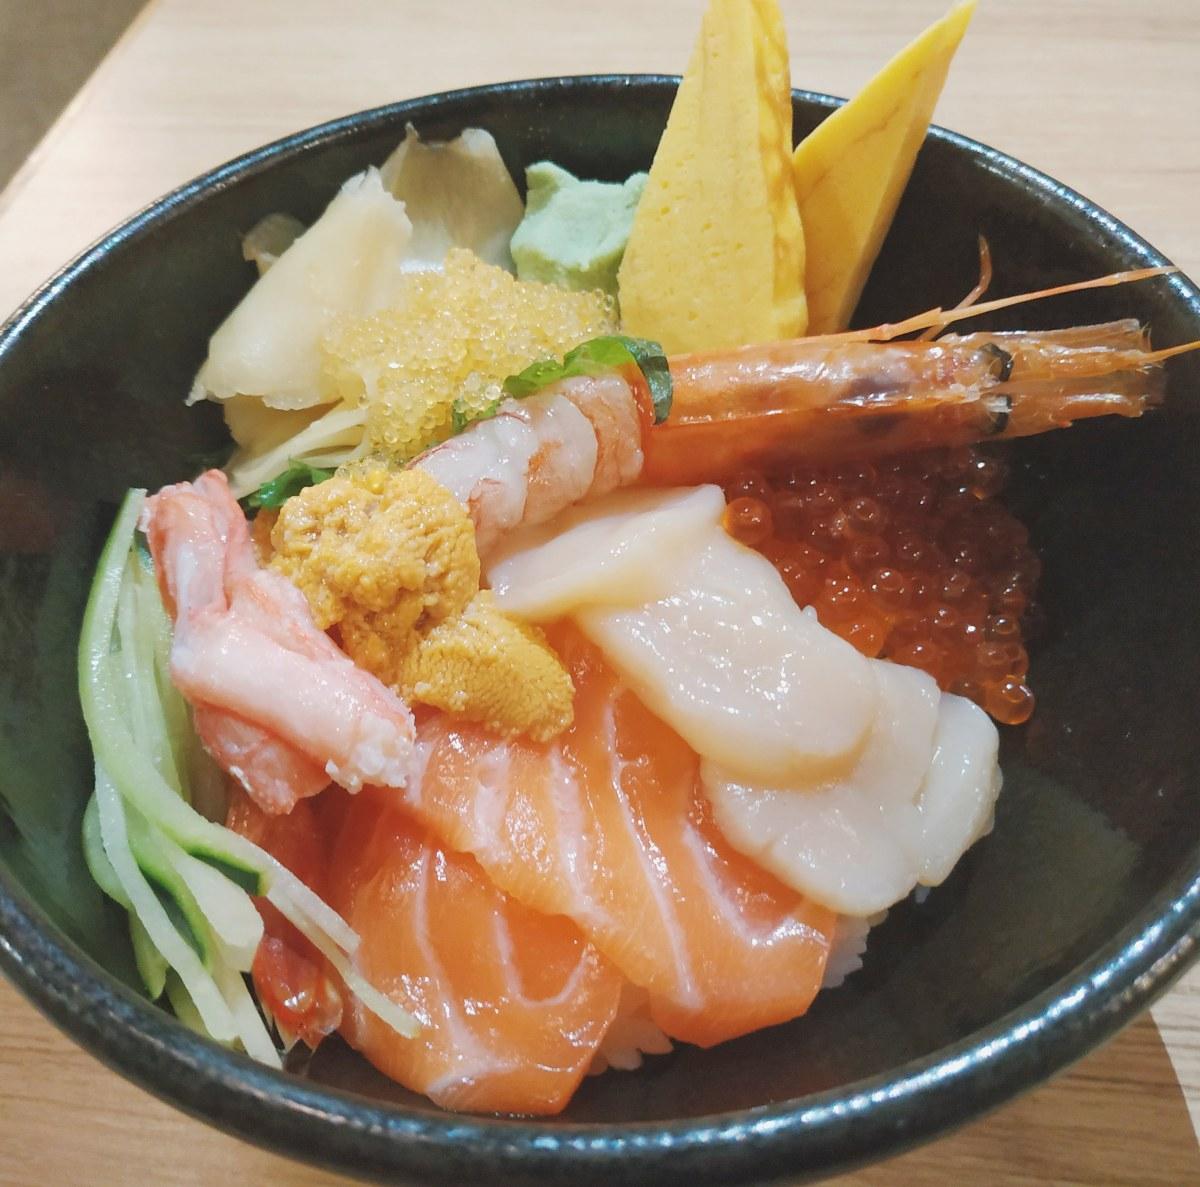 Tsukiji Fish Market Restaurant - Orchard